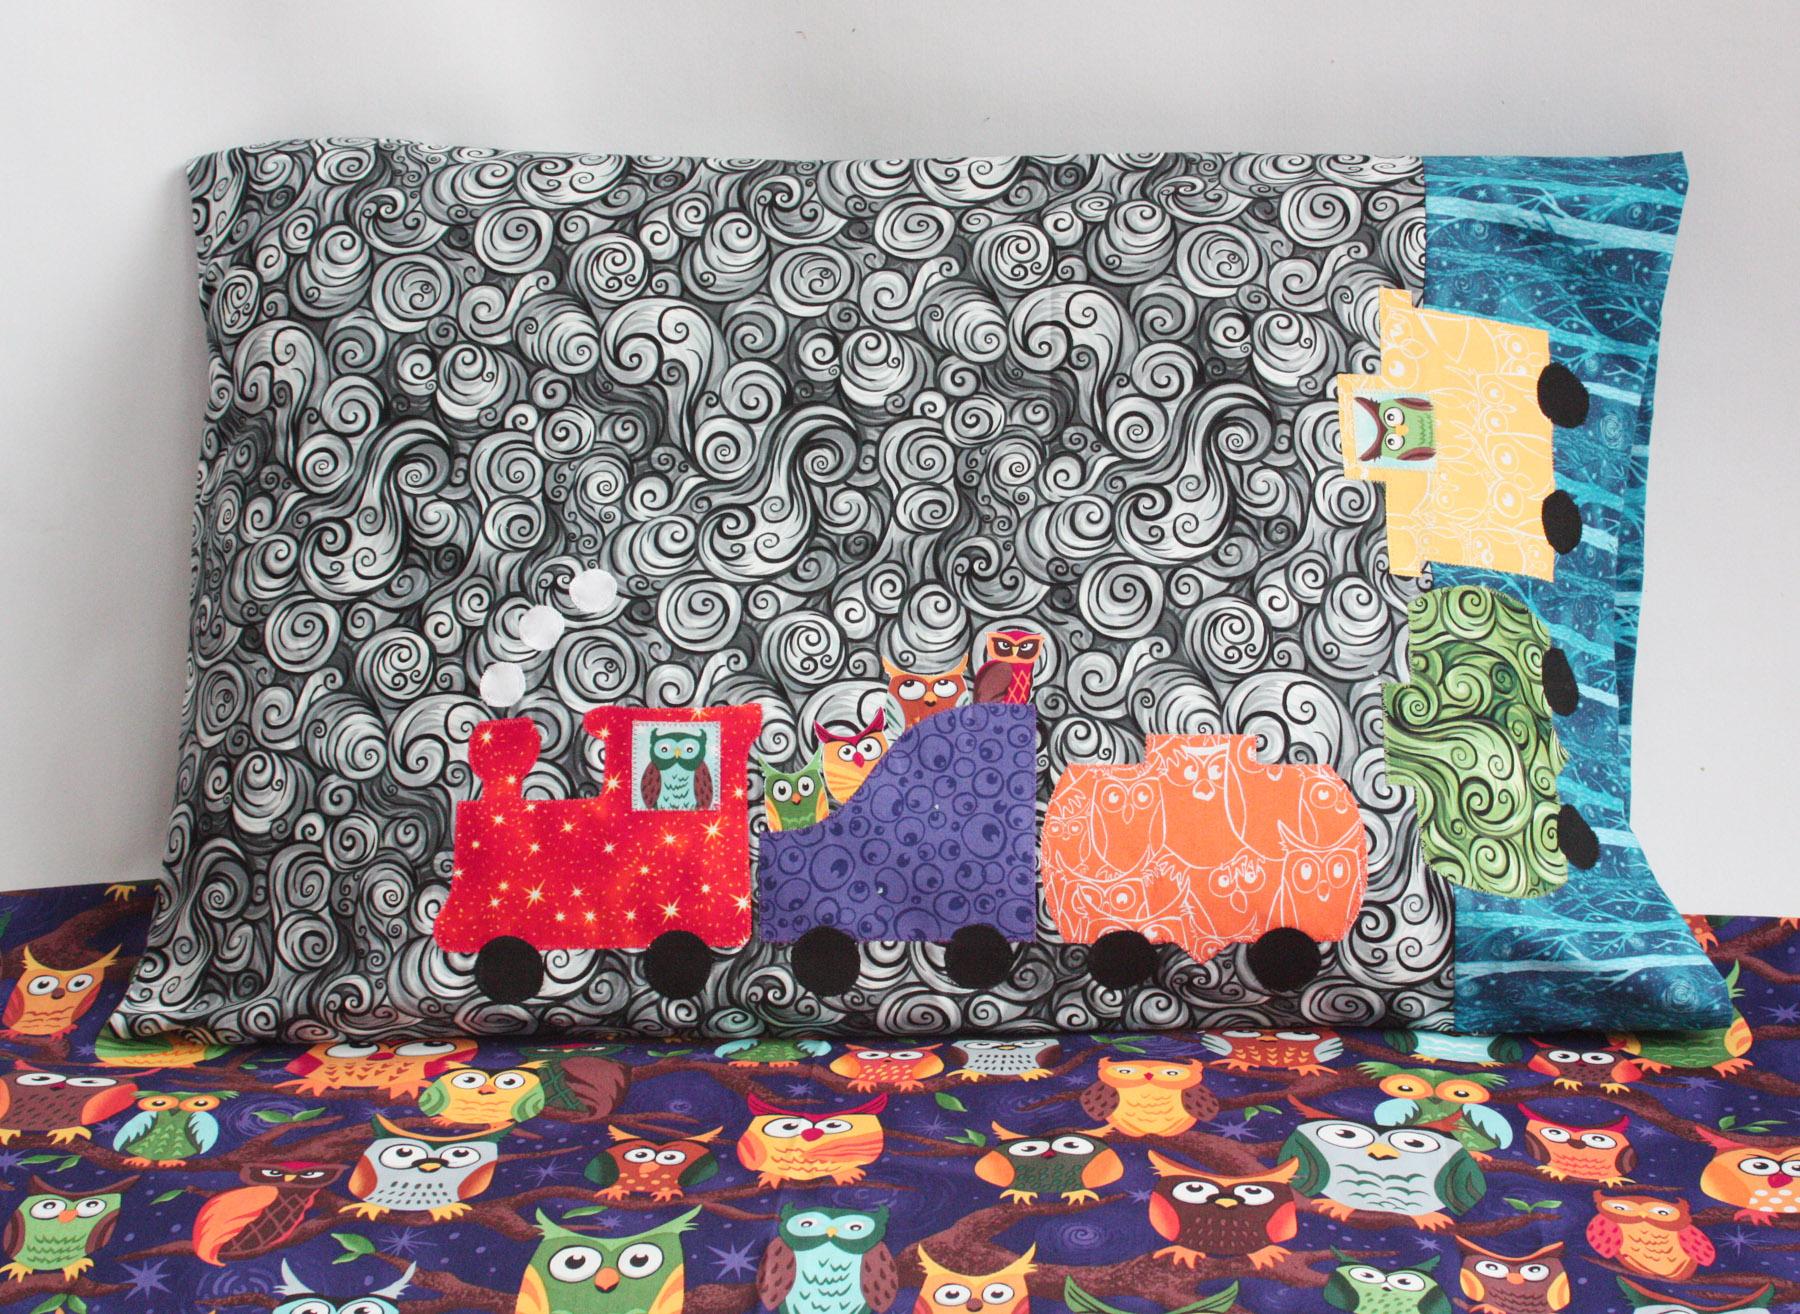 Fabri-Quilt's Pillowcase